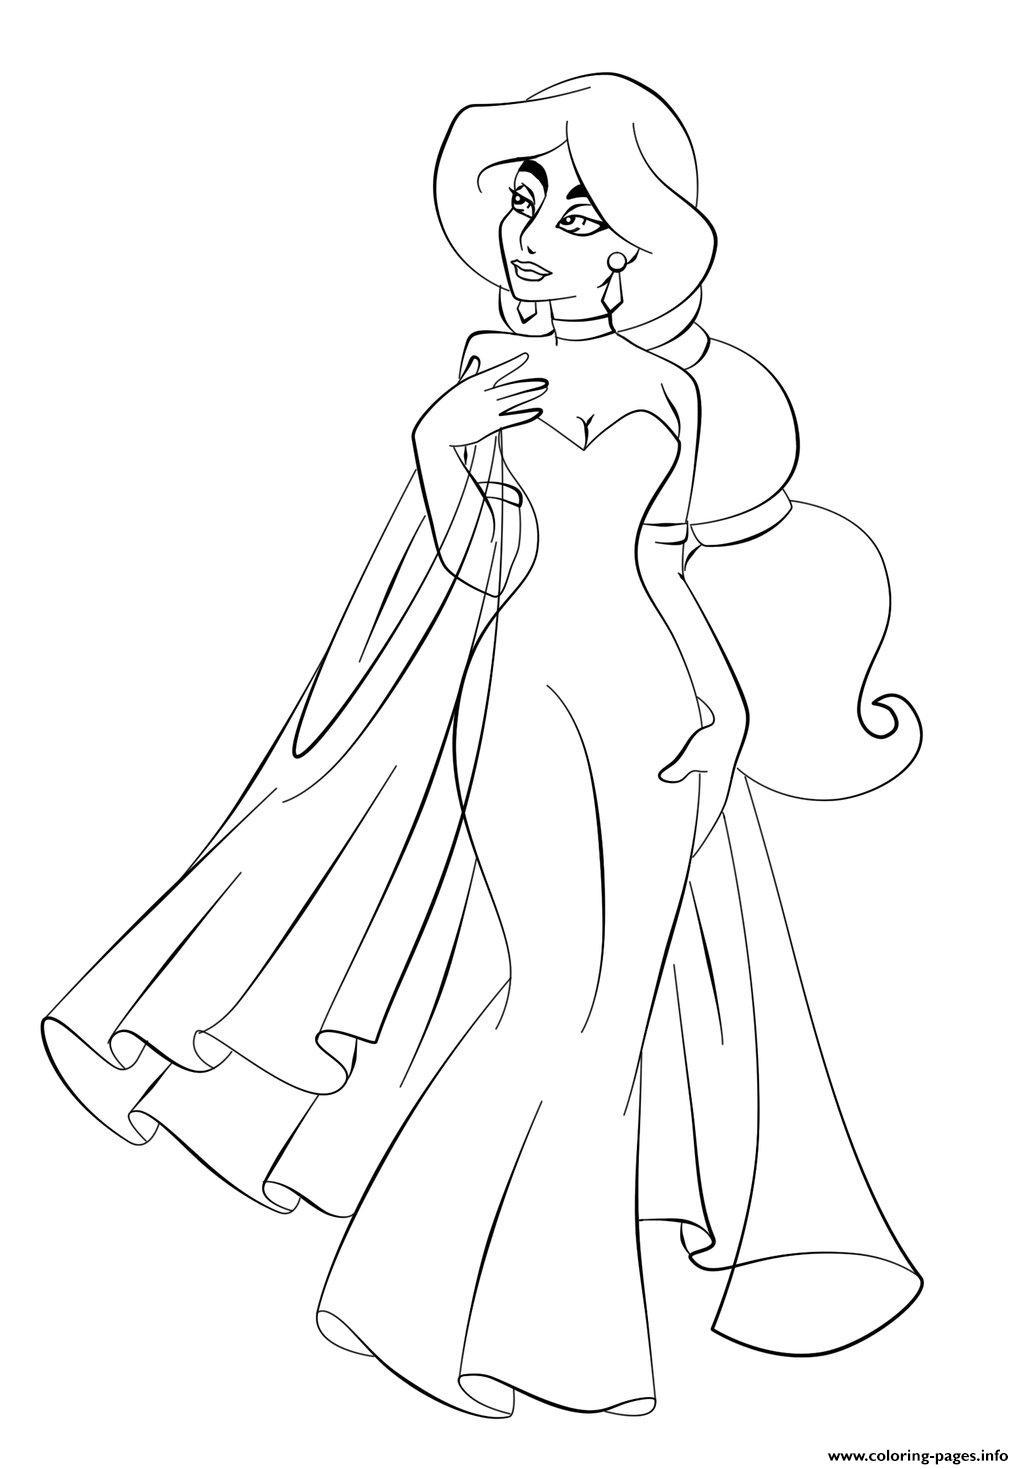 Jasmine In Wedding Dress Disney Princess S6993 Coloring ... | free coloring pages disney princess jasmine